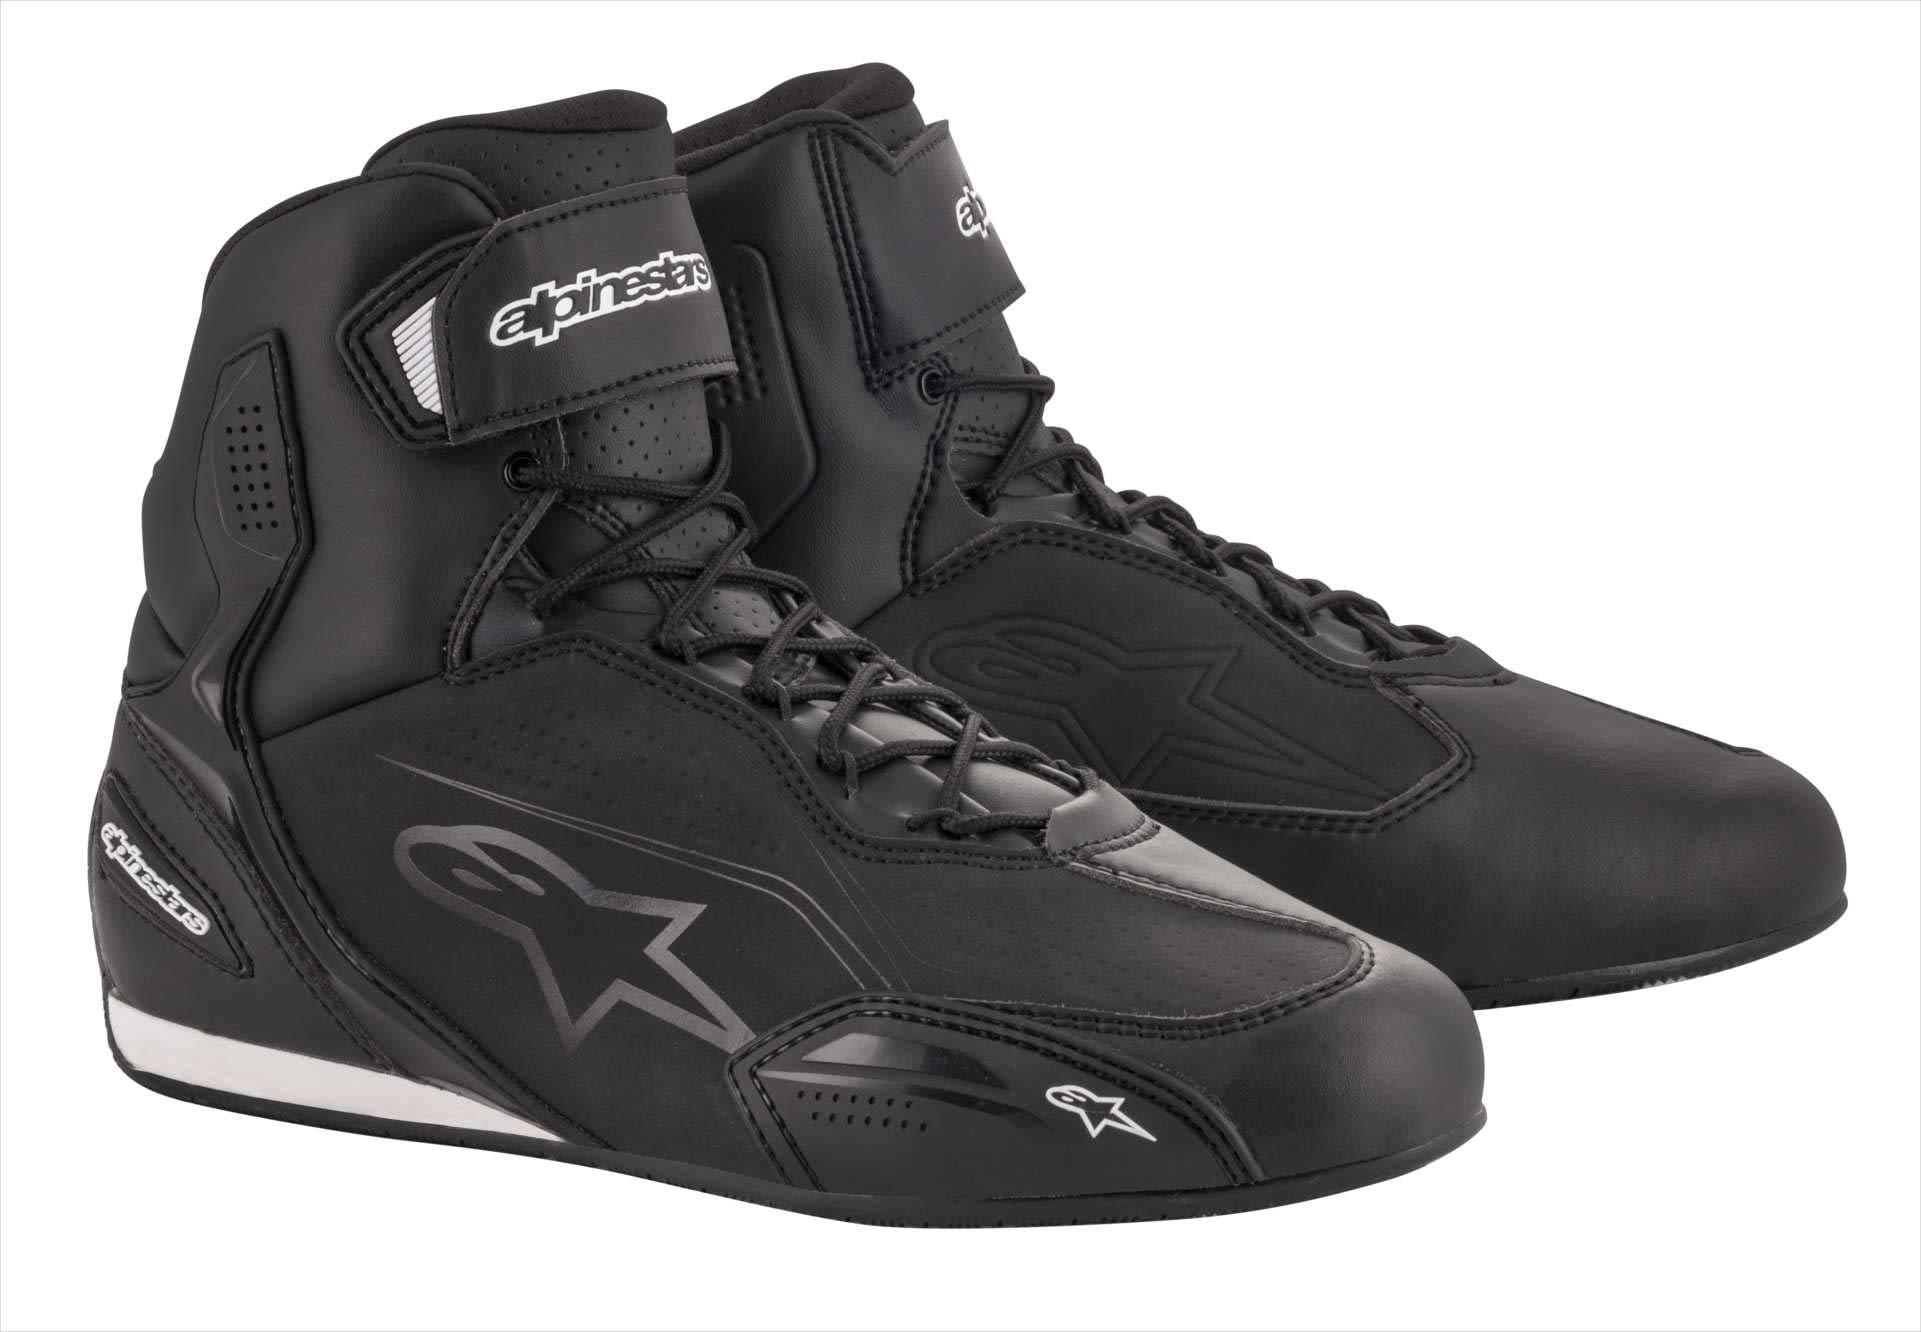 Alpinestars Faster-3 Shoes (8, Black/Black)